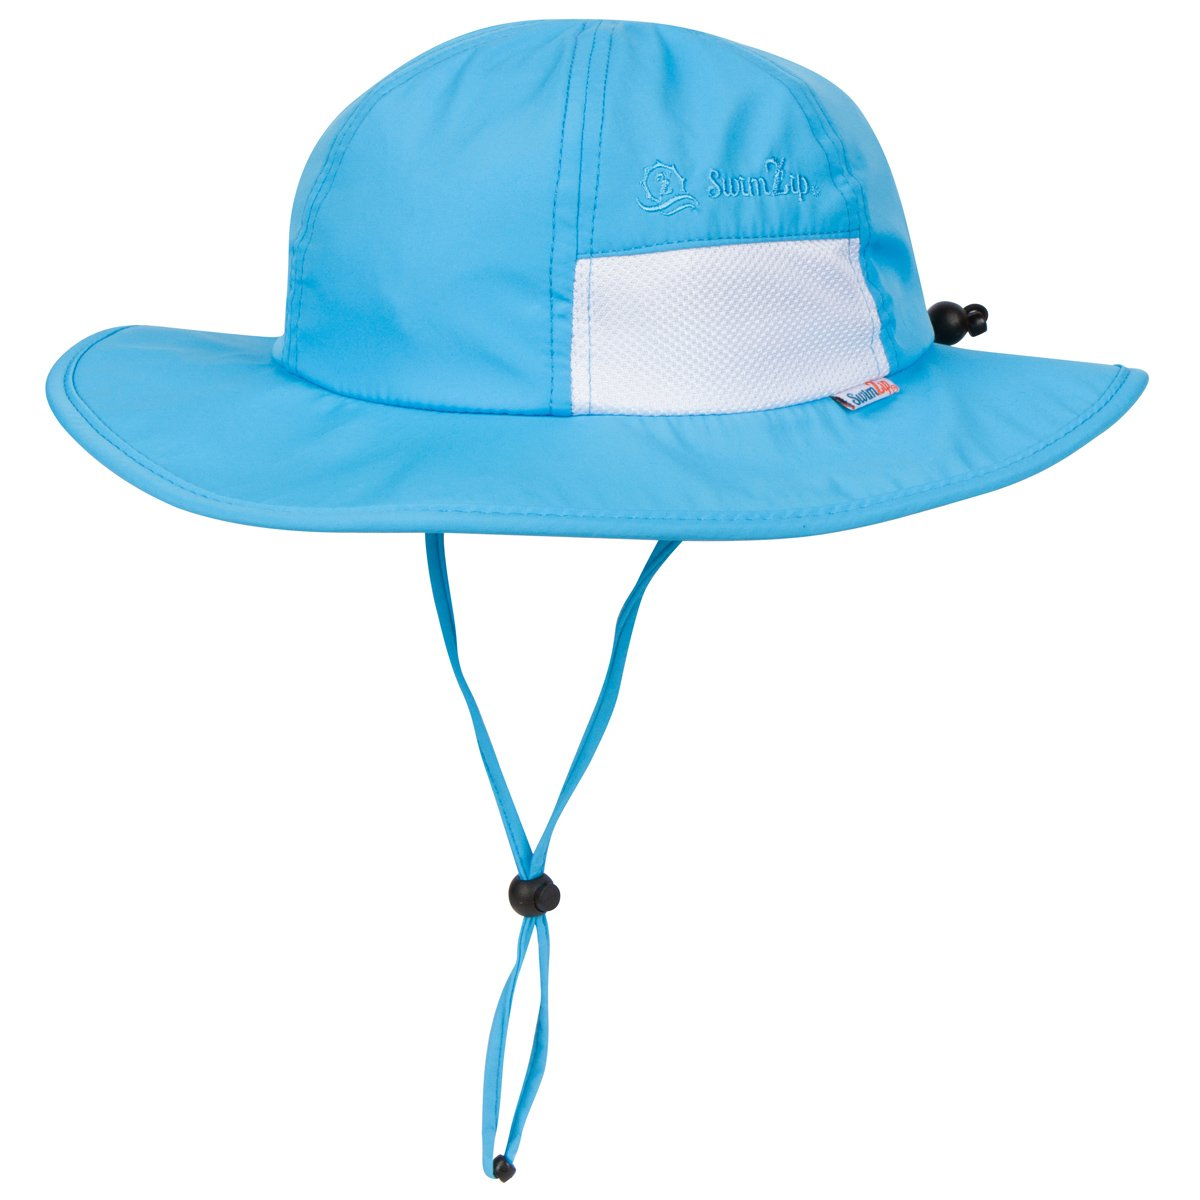 SwimZip Unisex Child Wide Brim Sun Protection Hat UPF 50 Adjustable Aqua 6-24 Month